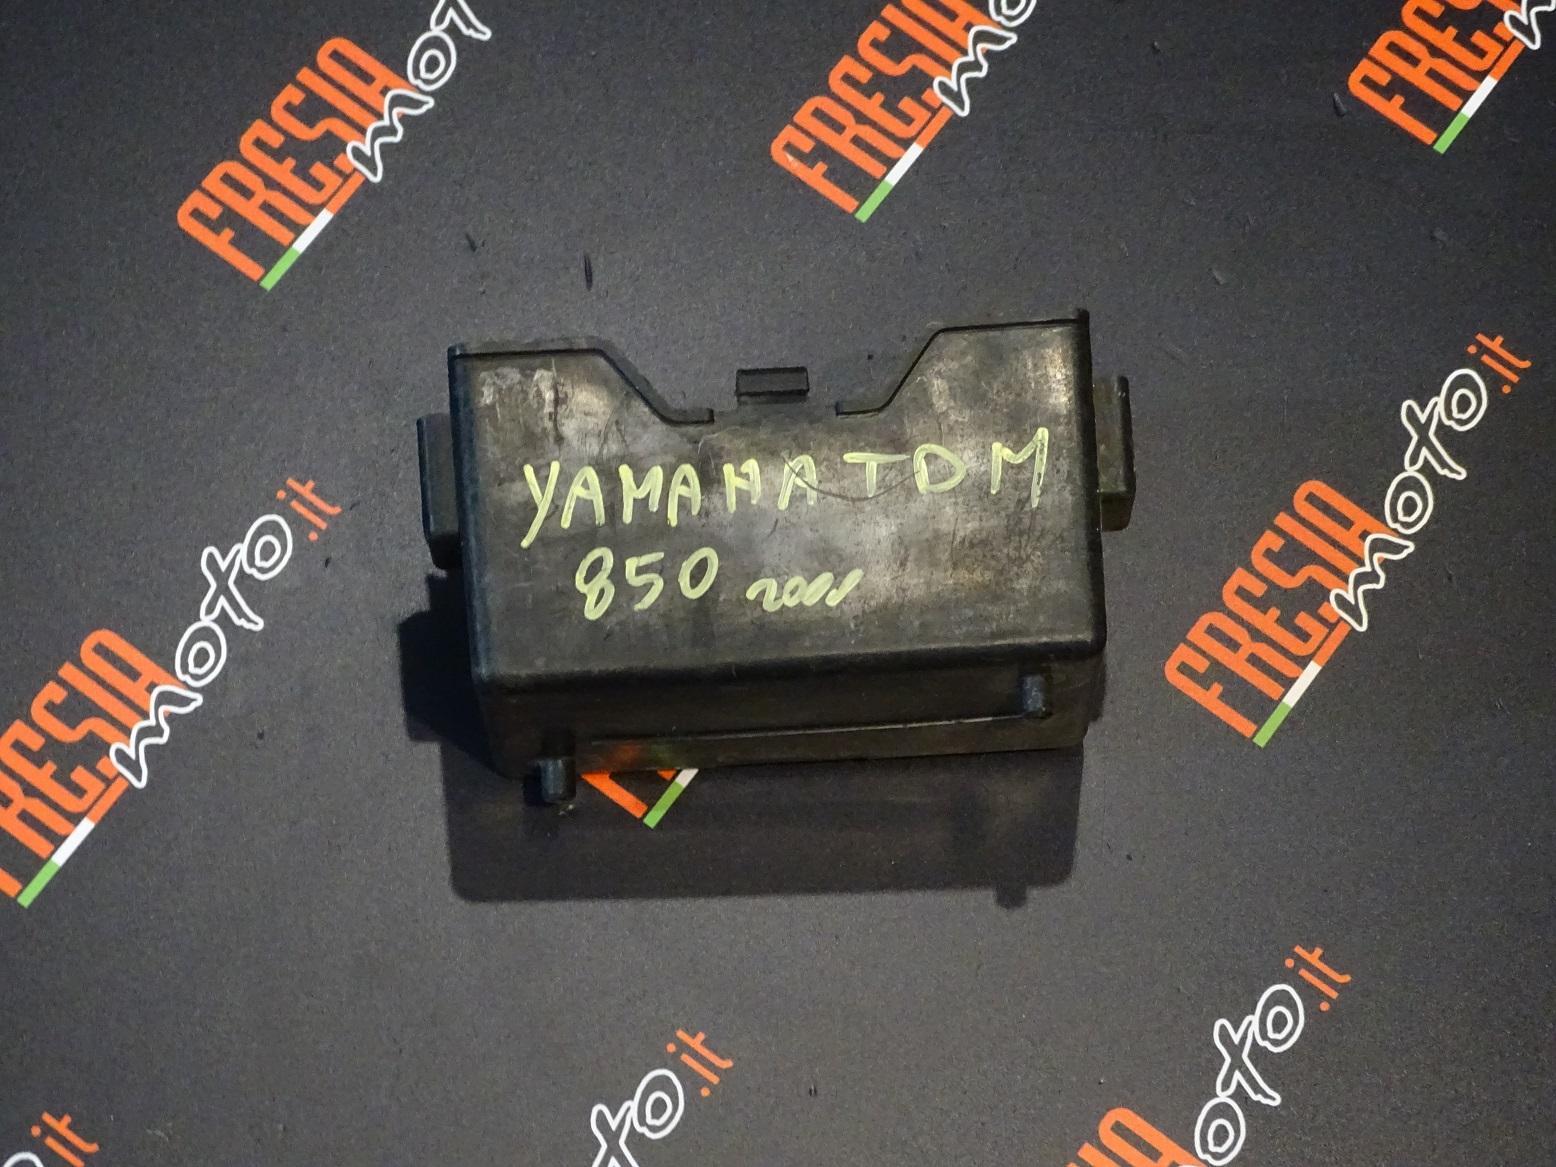 PORTABATTERIA USATO YAMAHA TDM 850 DEL 1992